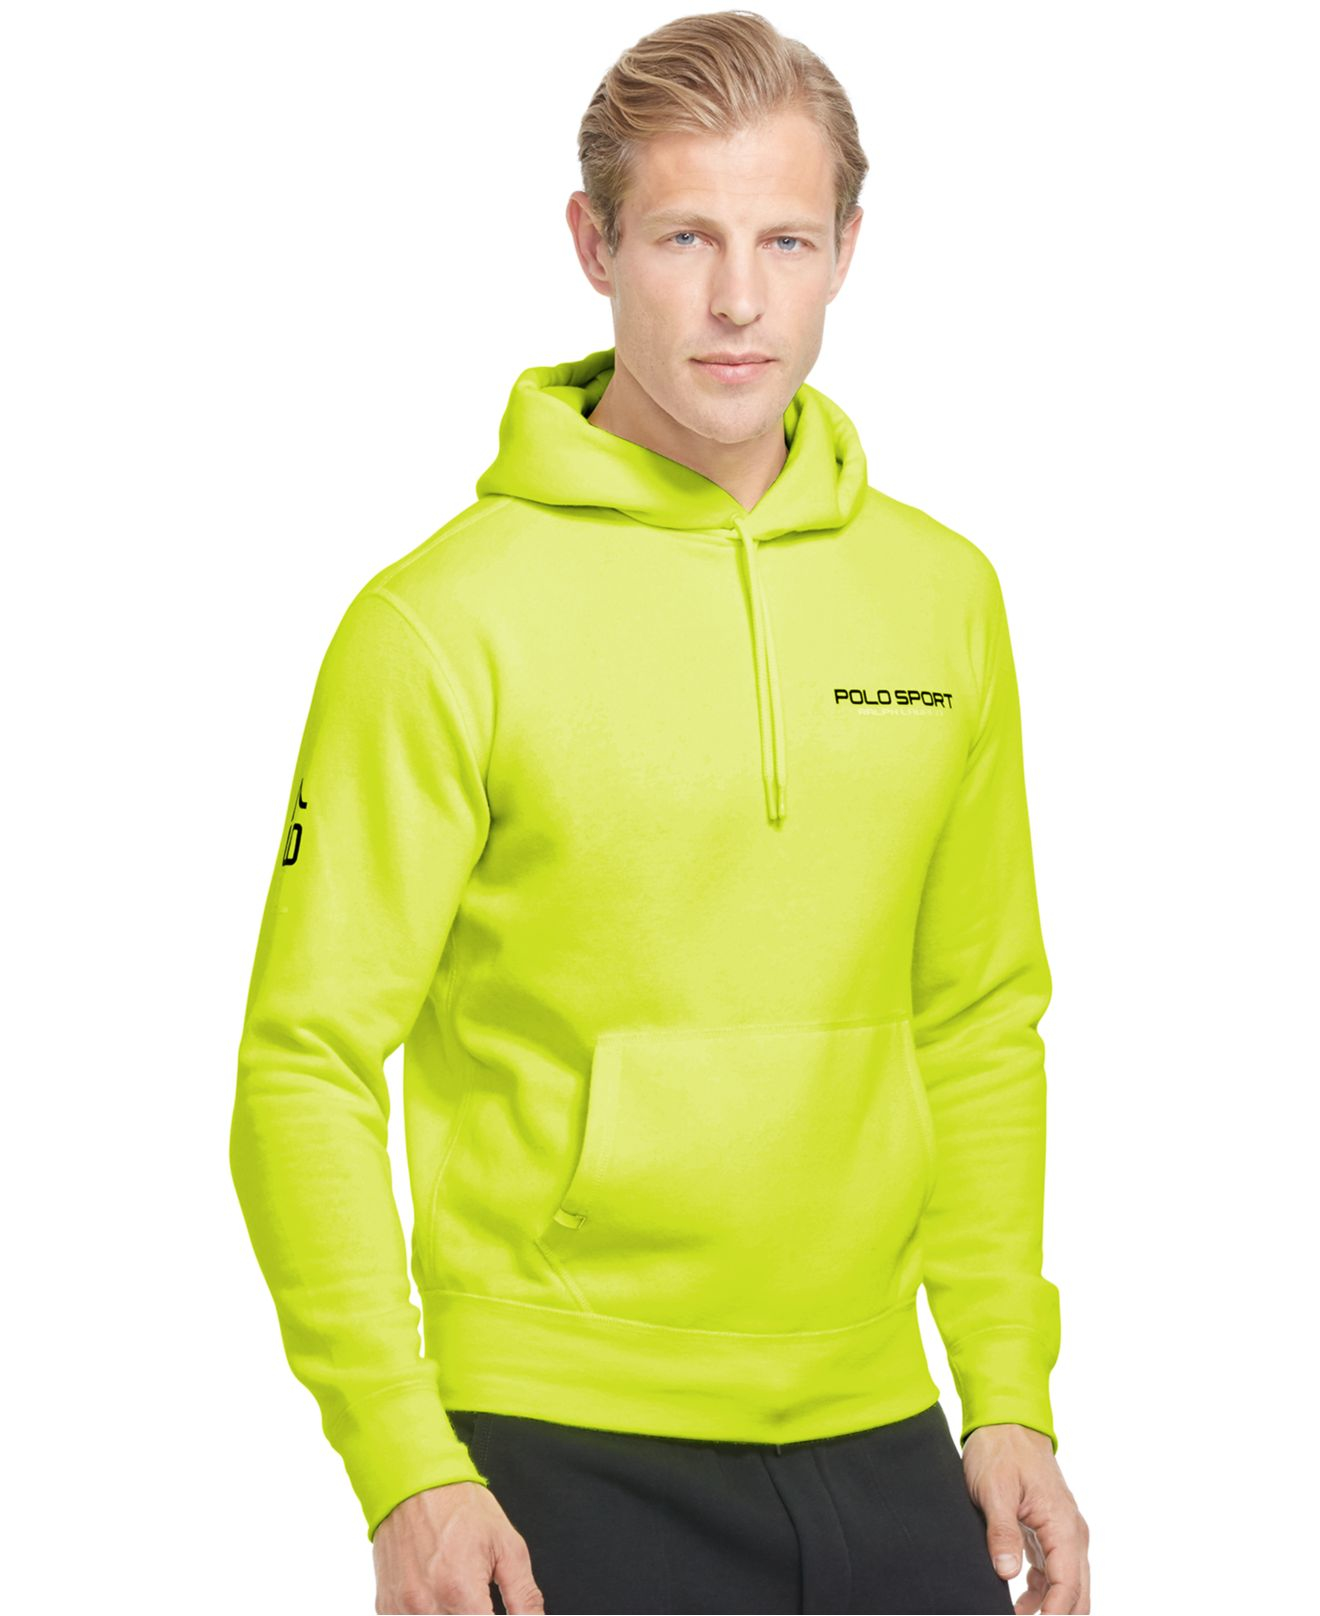 Polo ralph lauren Polo Sport Neon Fleece Pullover Hoodie in Yellow ...